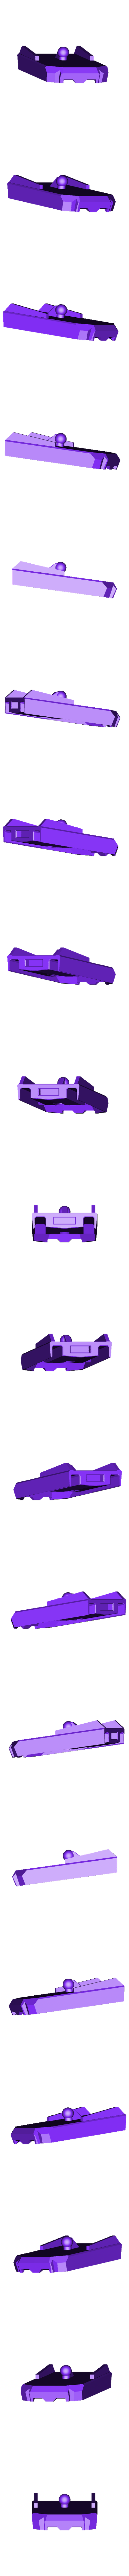 8_Drag_Head8_Neck3_BLACK.stl Download STL file ARTICULATED DRAGONLORD (not Dragonzord) - NO SUPPORT • 3D printer model, Toymakr3D